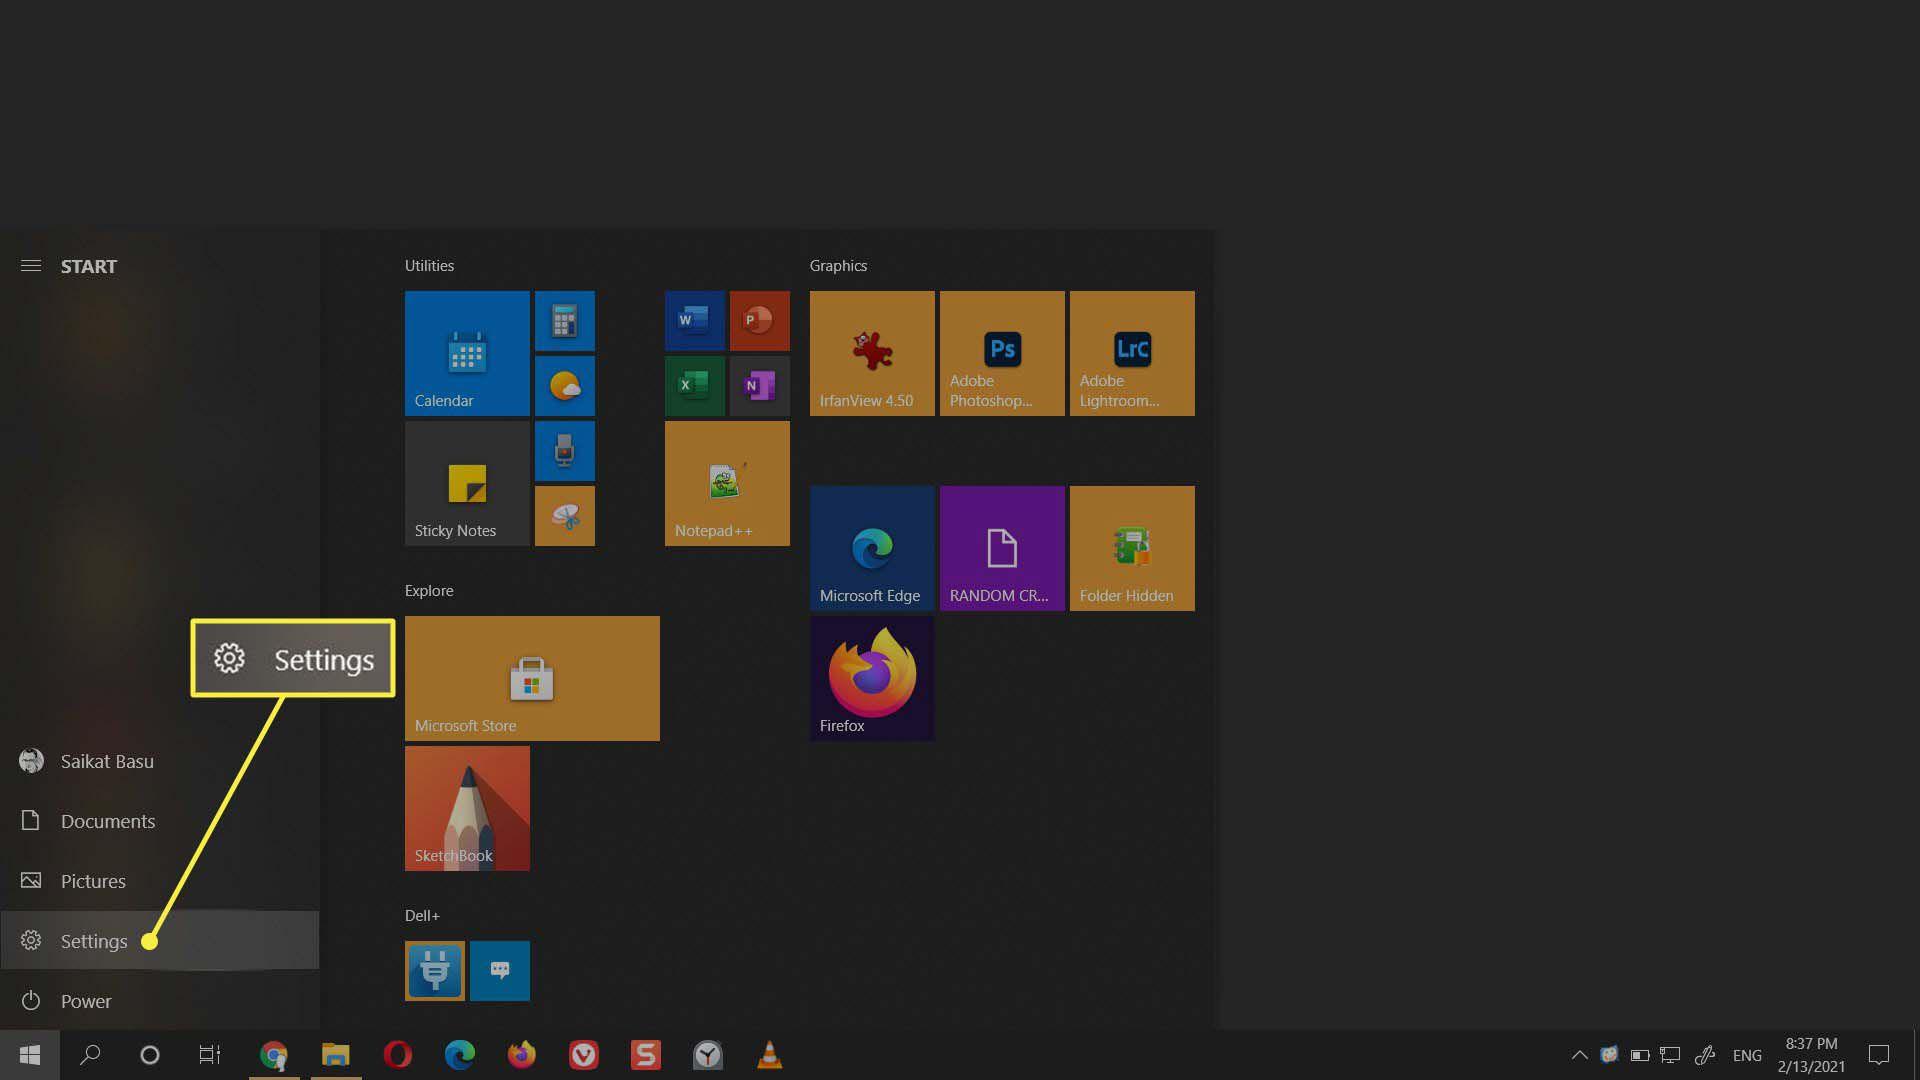 The Settings menu item from the Start menu in Windows.